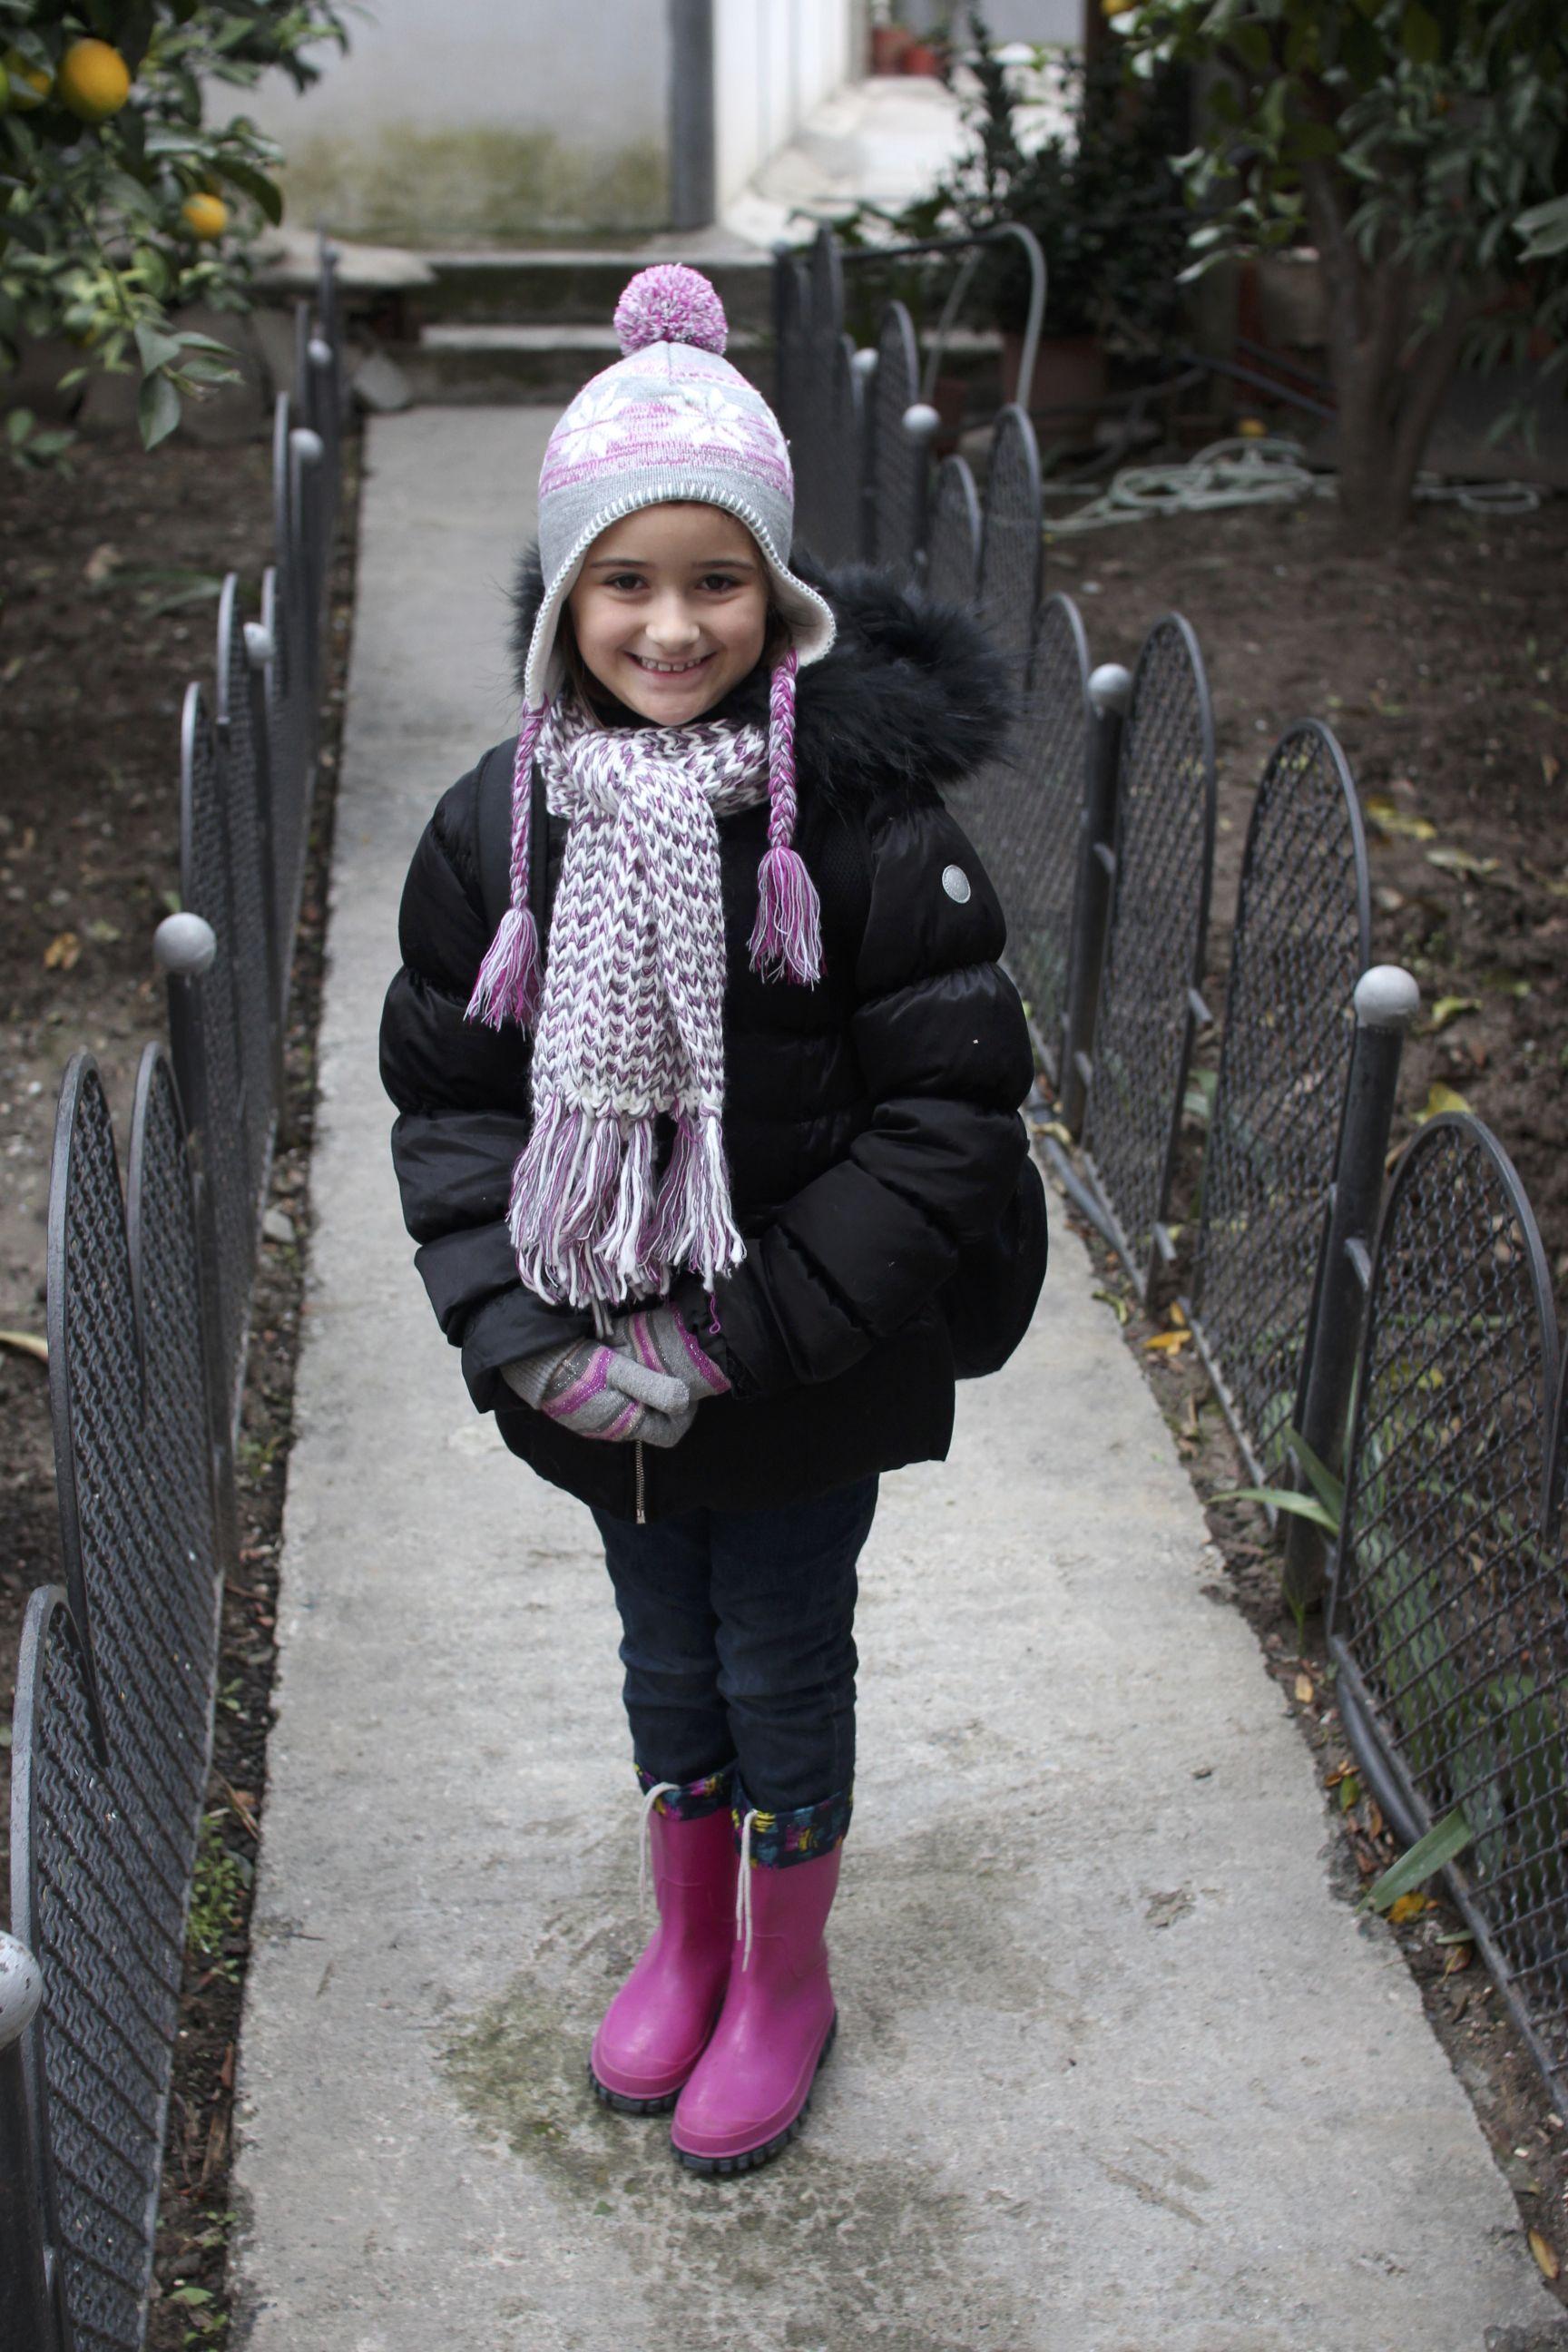 Xhiljana (Jillian) dressed up warm for a cold walk to school.